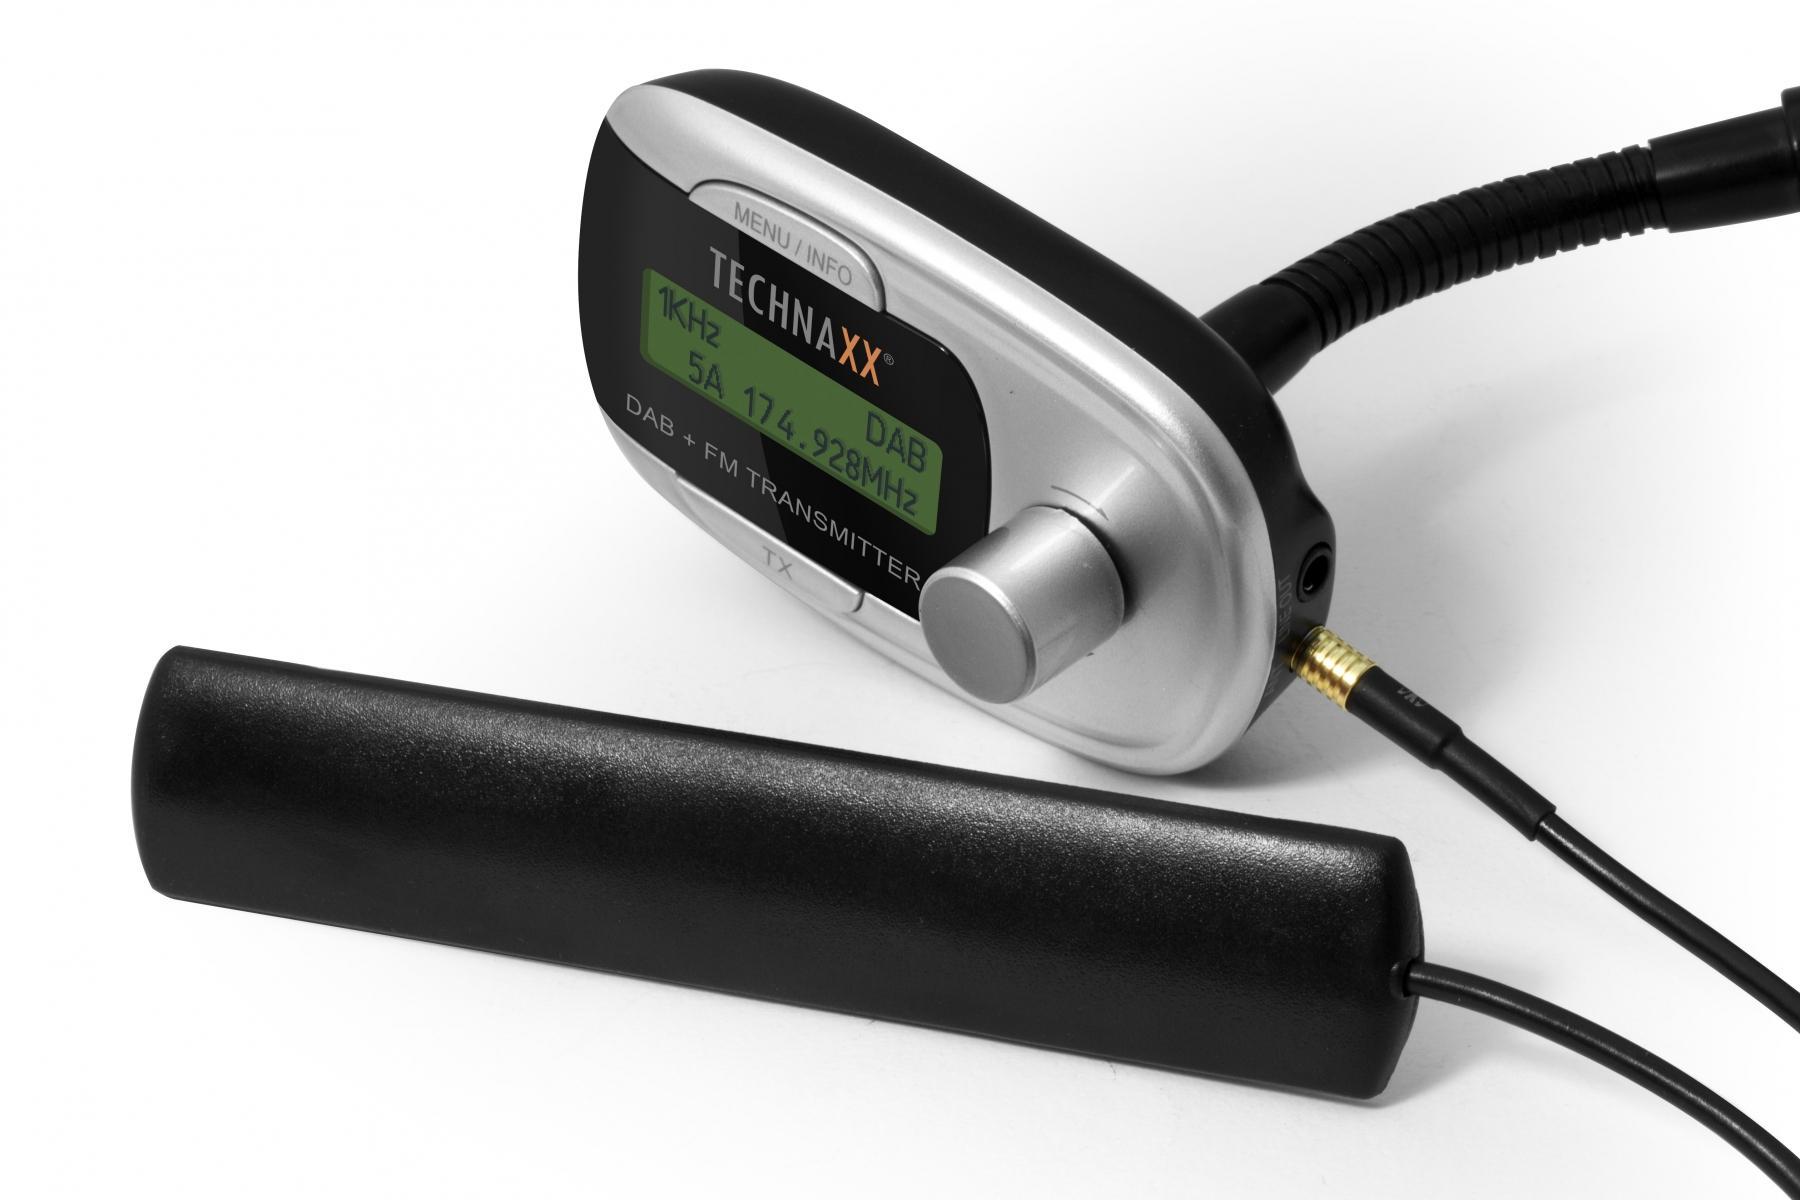 technaxx dab fm transmitter t800. Black Bedroom Furniture Sets. Home Design Ideas